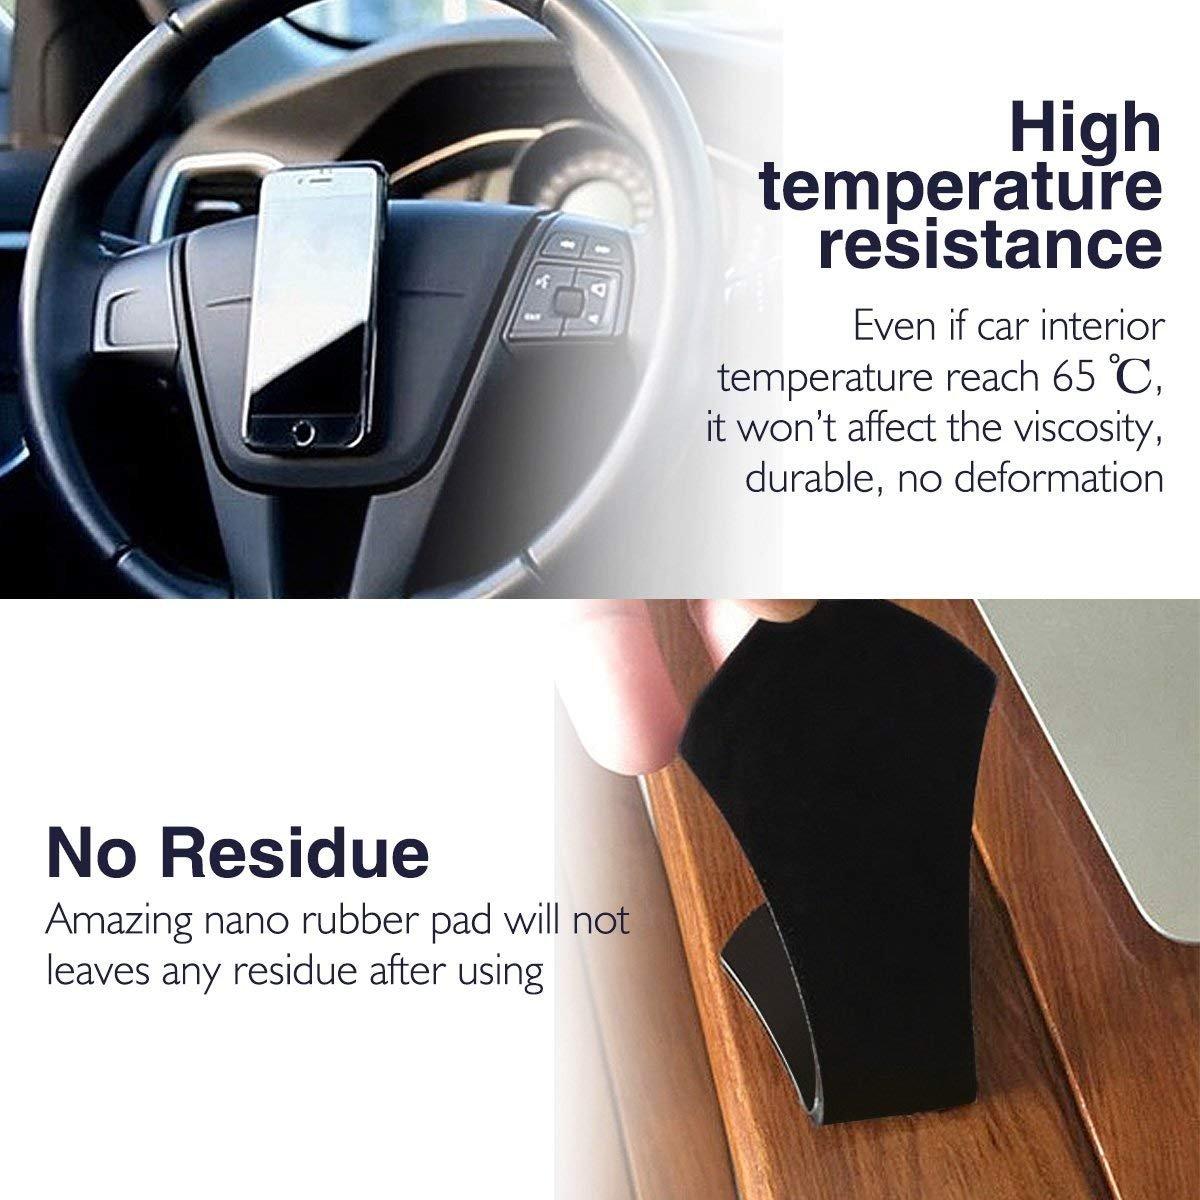 NOFDA 2pcs Magic Nano Rubber Pad Anti Slip Mat Sticker No Trace Car Mobile Phone Holder Lazy Bracket Pods Sticky Gel Pad Wholesale 5558979512 Pack 2